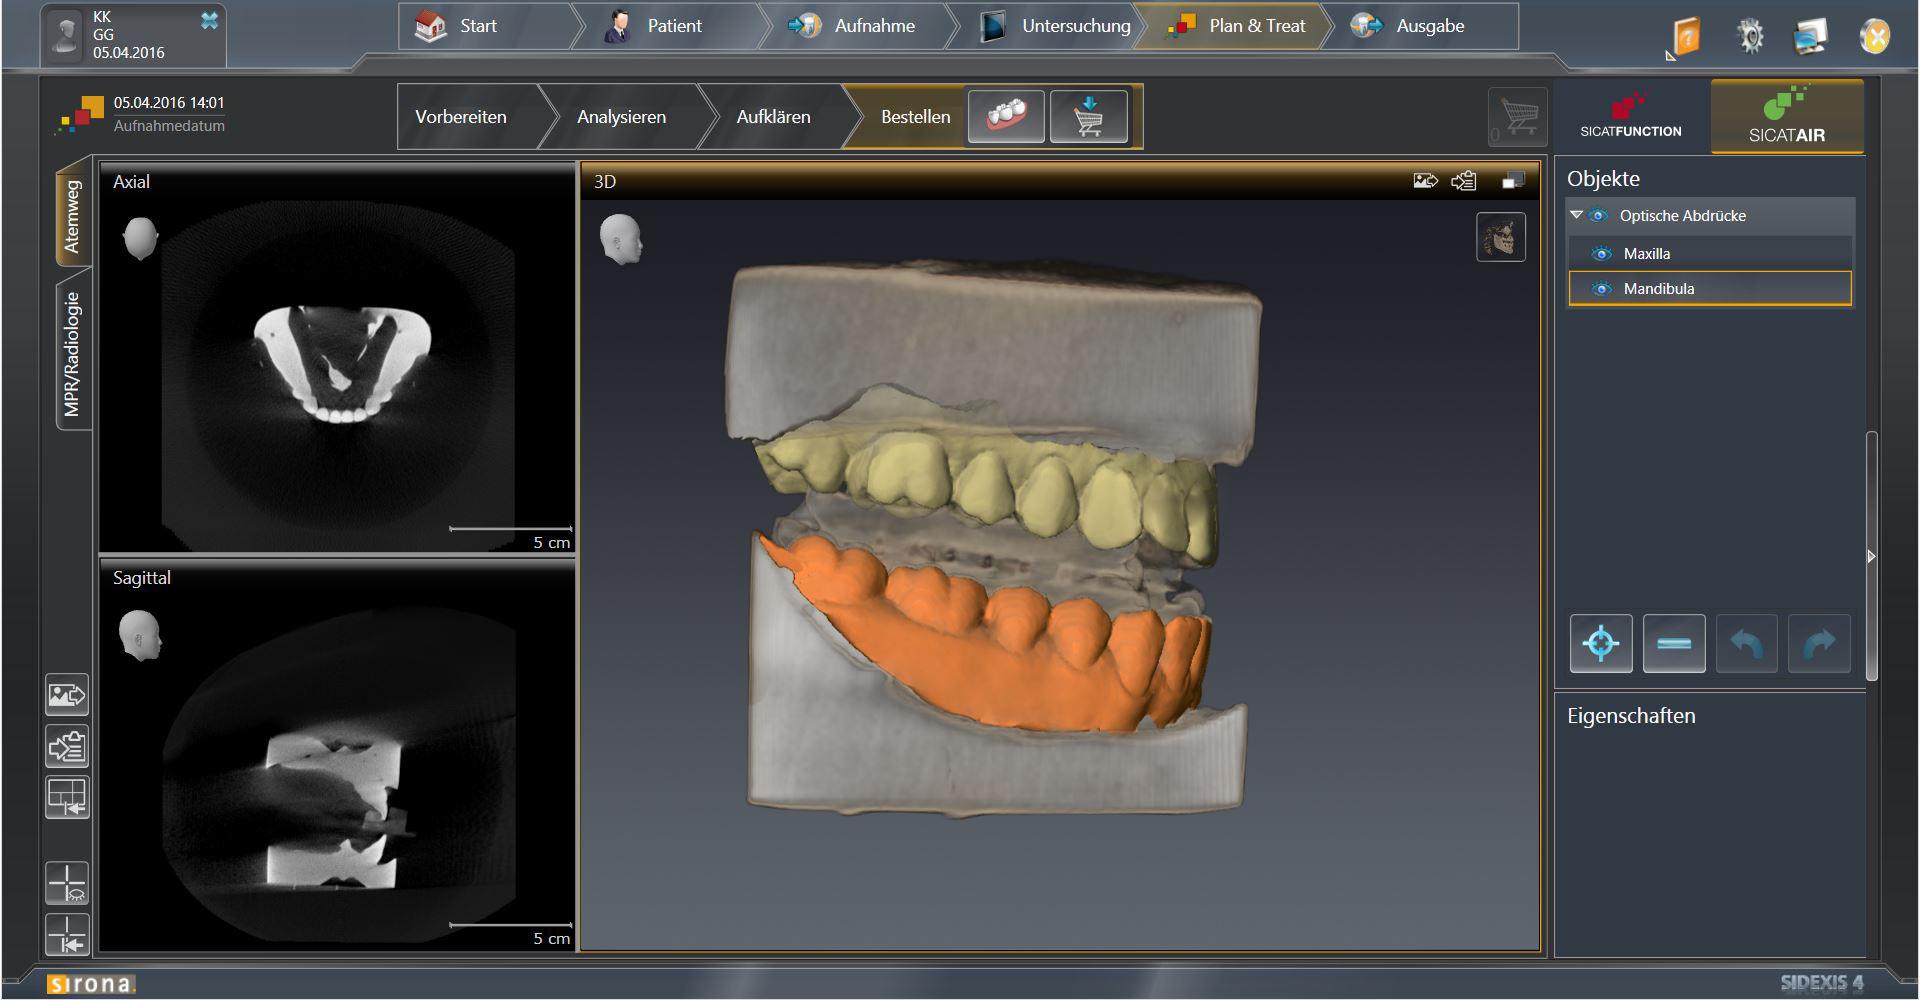 Why Digital Workflows Are Gaining Ground in Dental Sleep Medicine